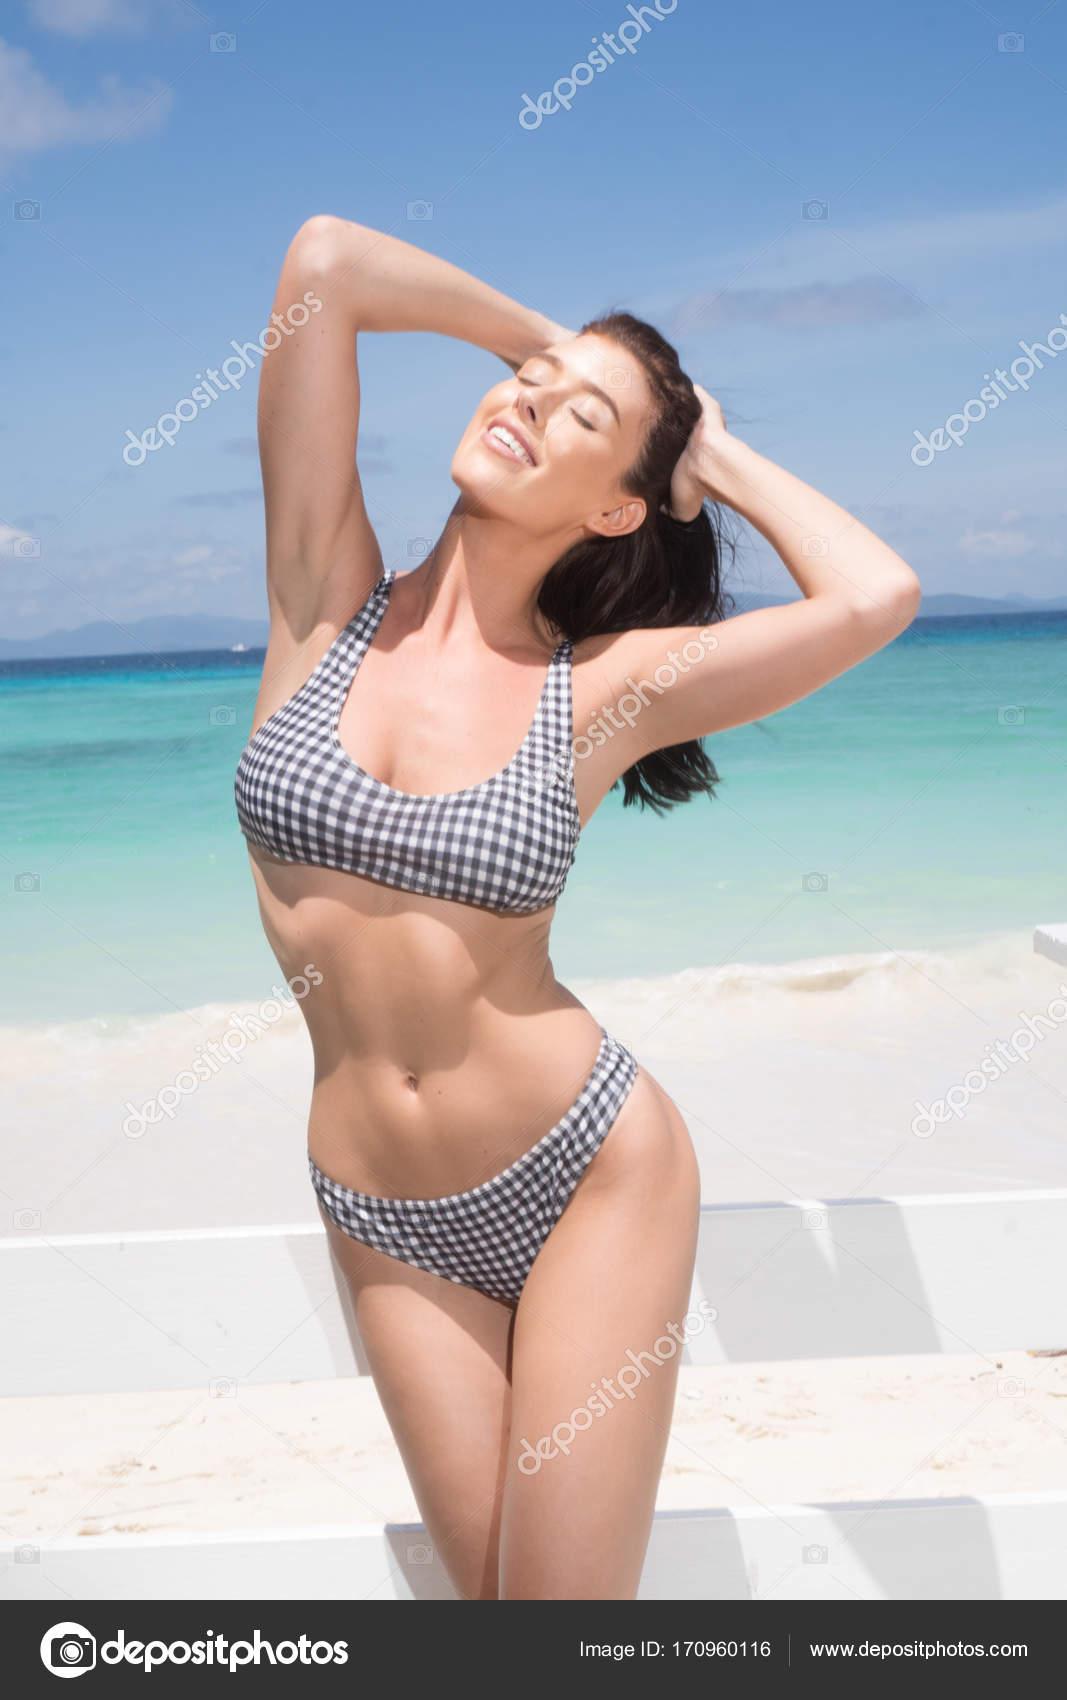 Bikini paradise pics #12